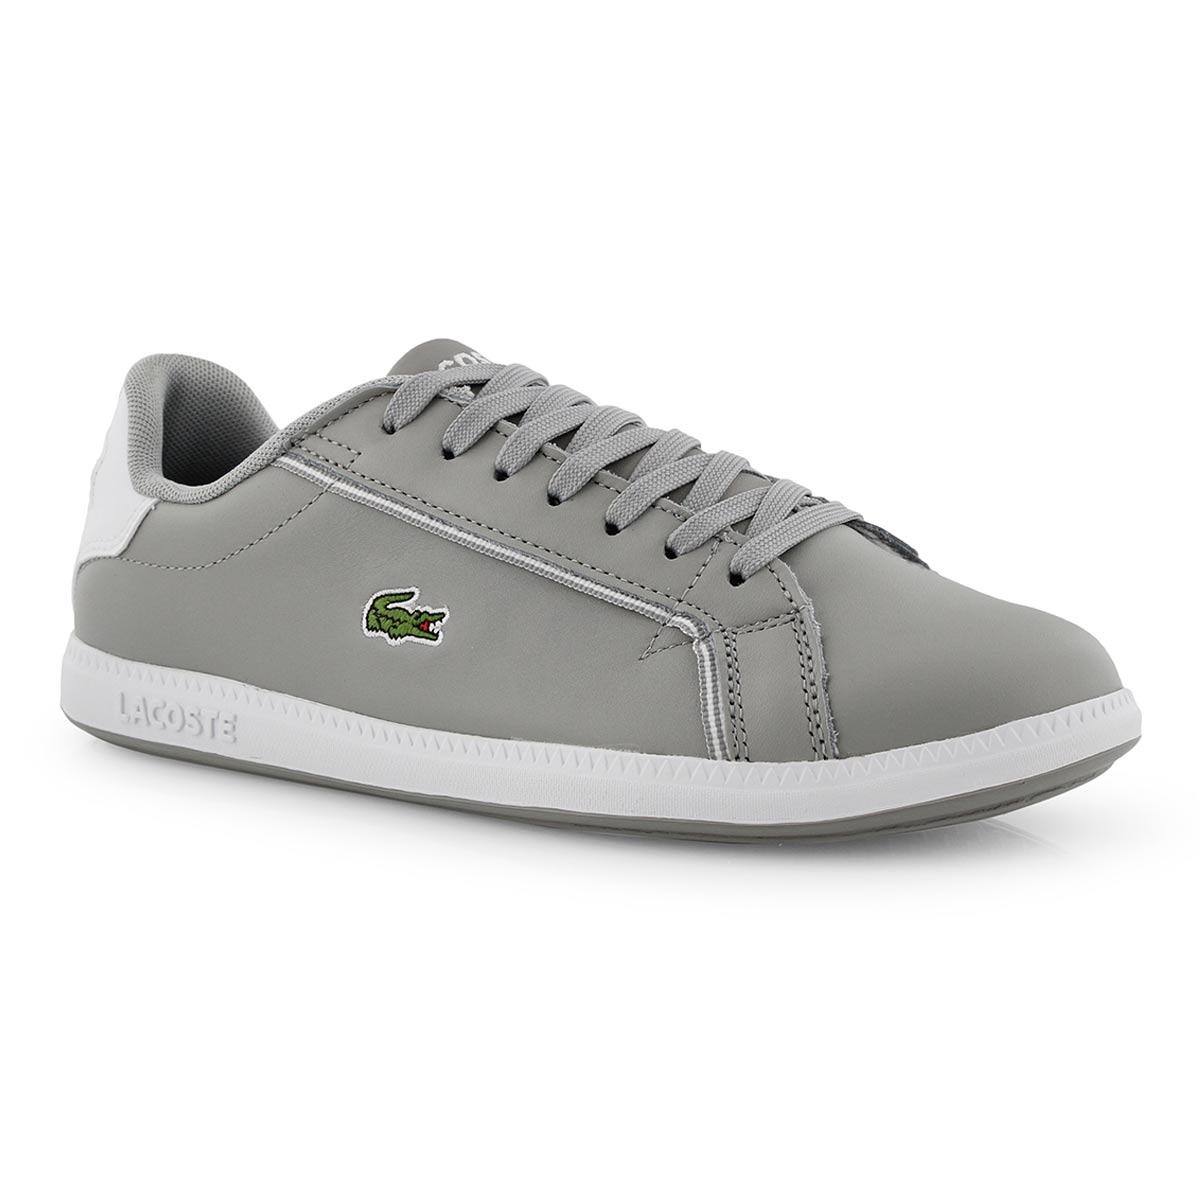 bd07a8f775 Women's GRADUATE 119 1 light grey/white sneakers